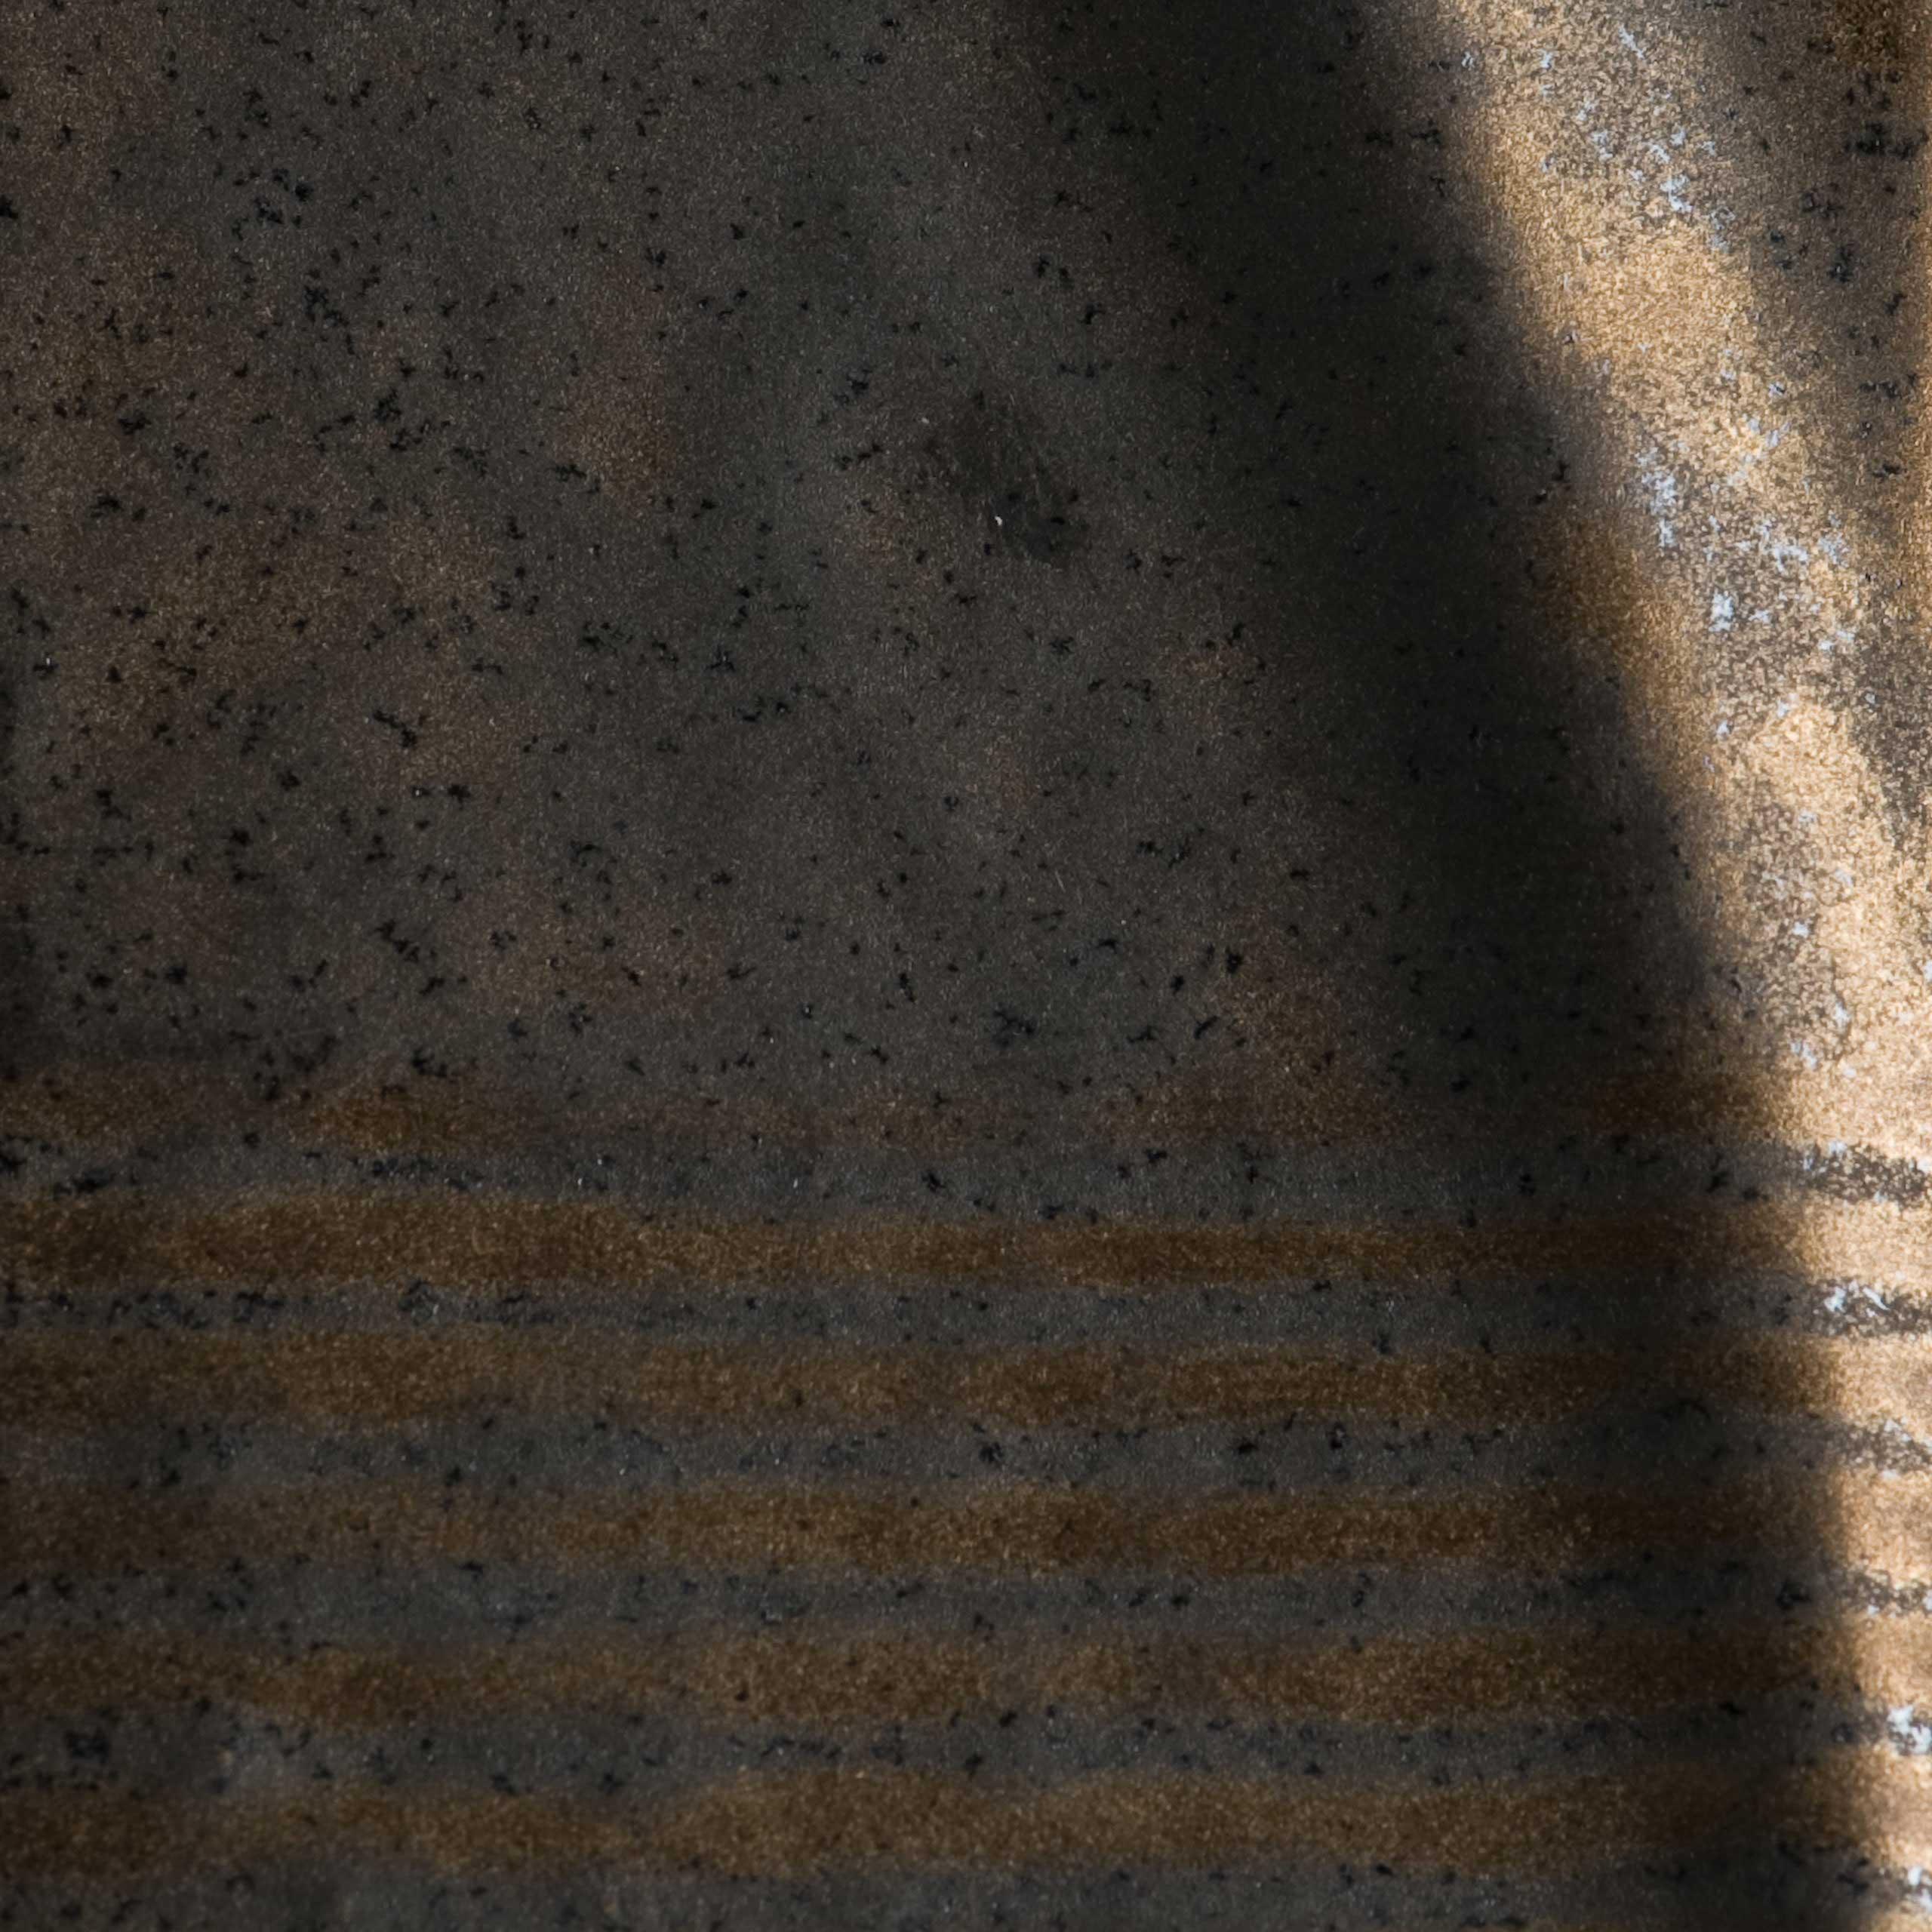 Matte Metallic Bronze